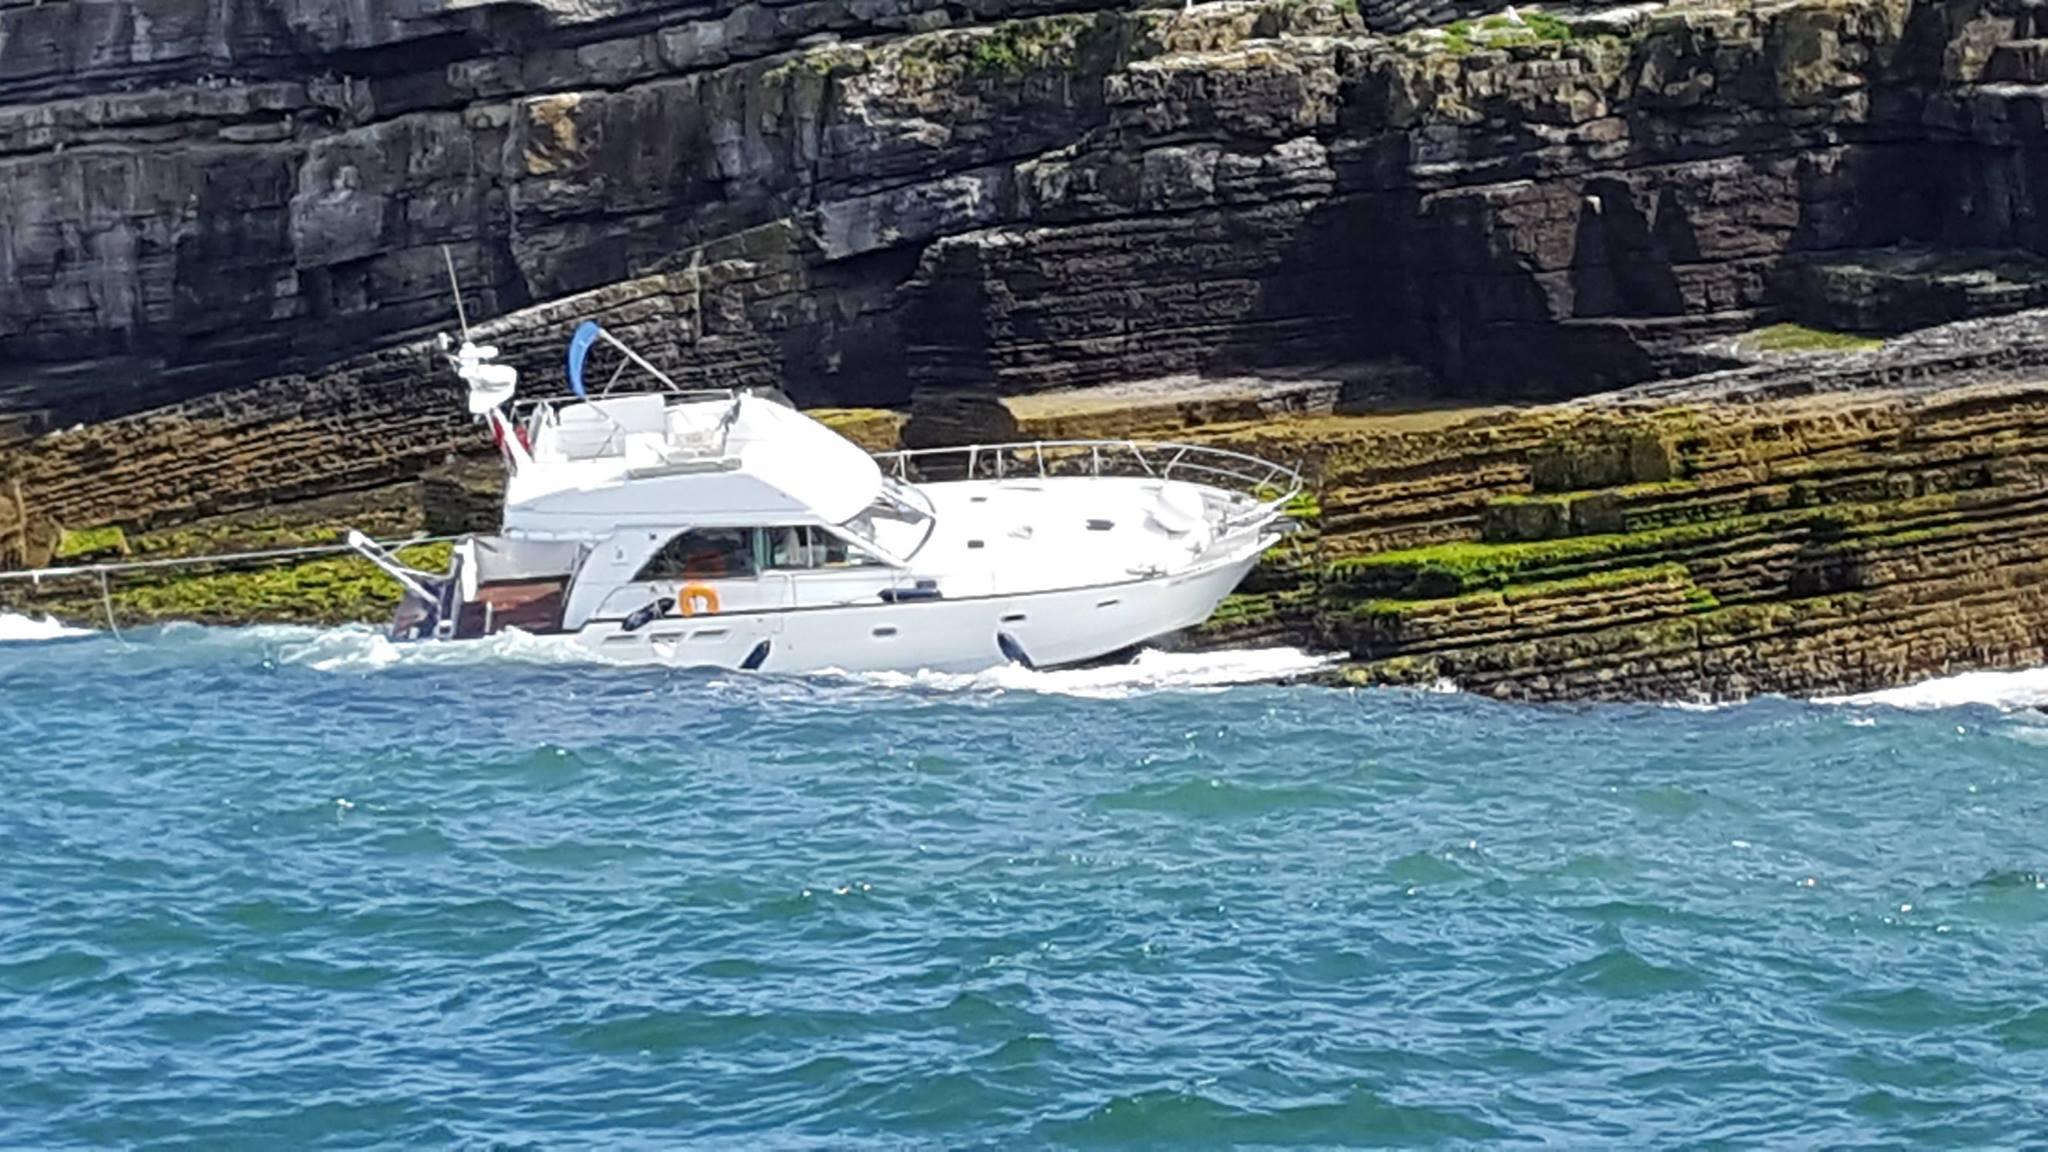 Motor Boat Le Babe Sinks Off Puffin Island Ybw